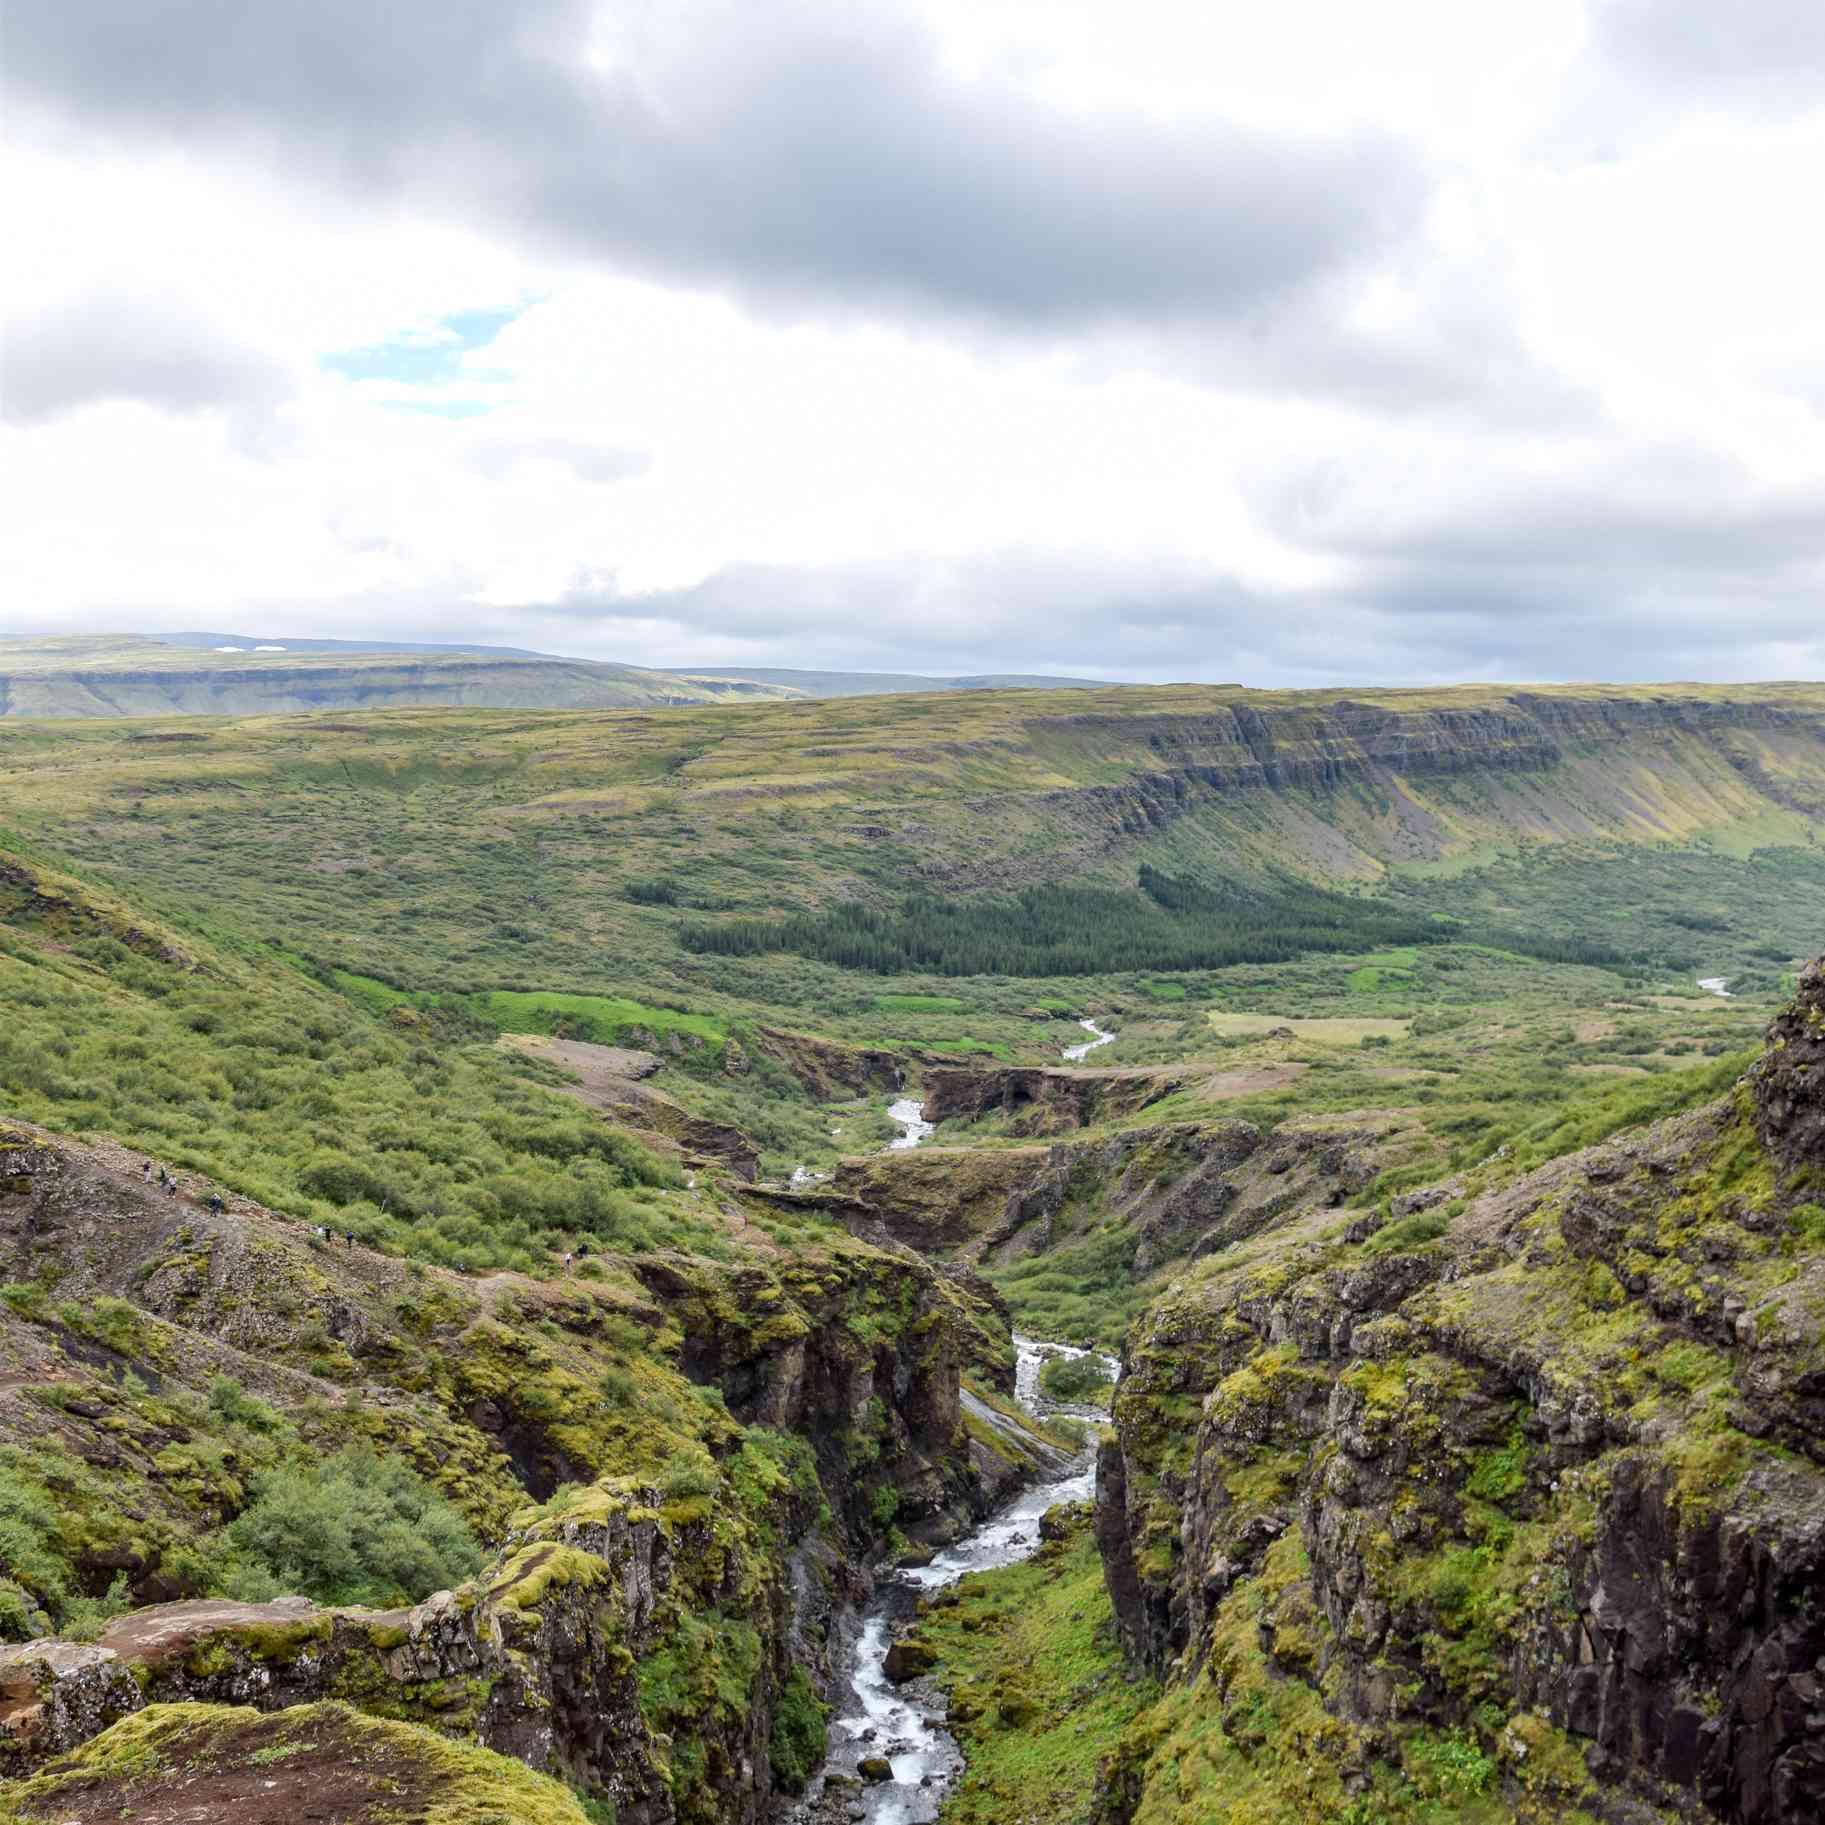 The Hike to Glymer Waterfall